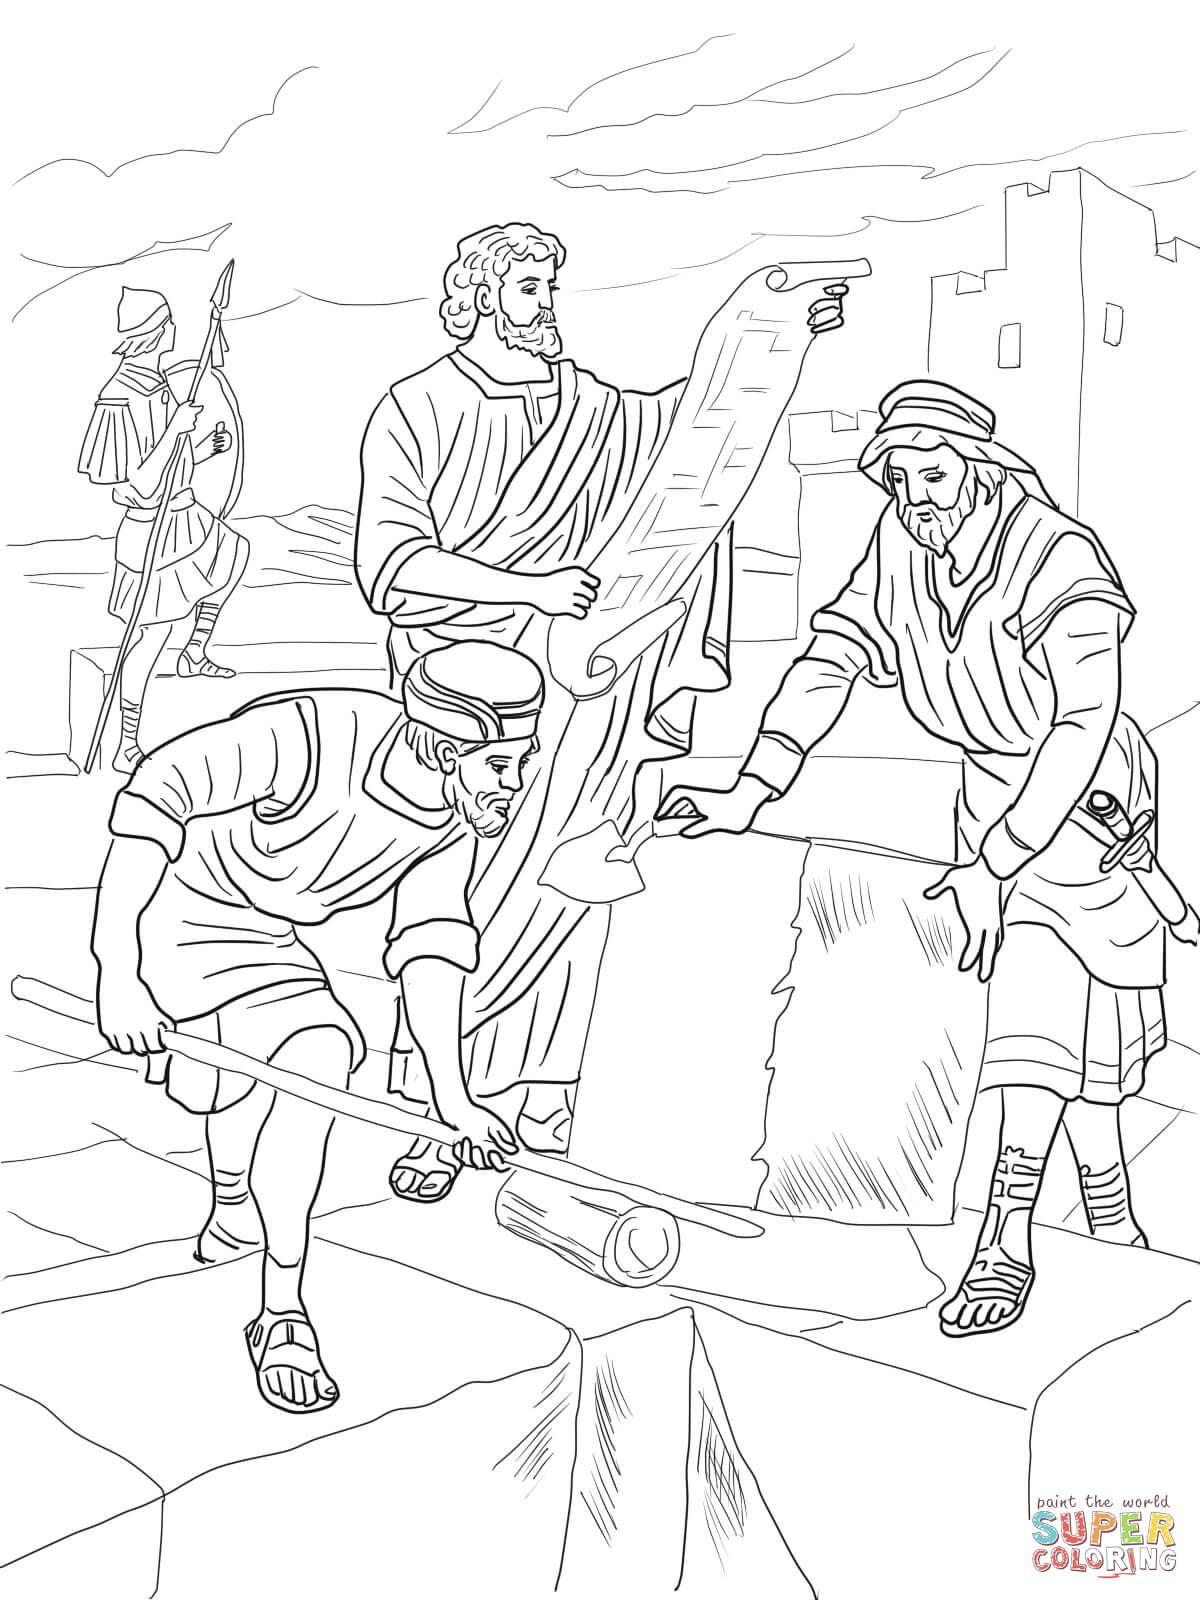 1-nehemiah-rebuilding-the-walls-of-jerusalem-coloring-page